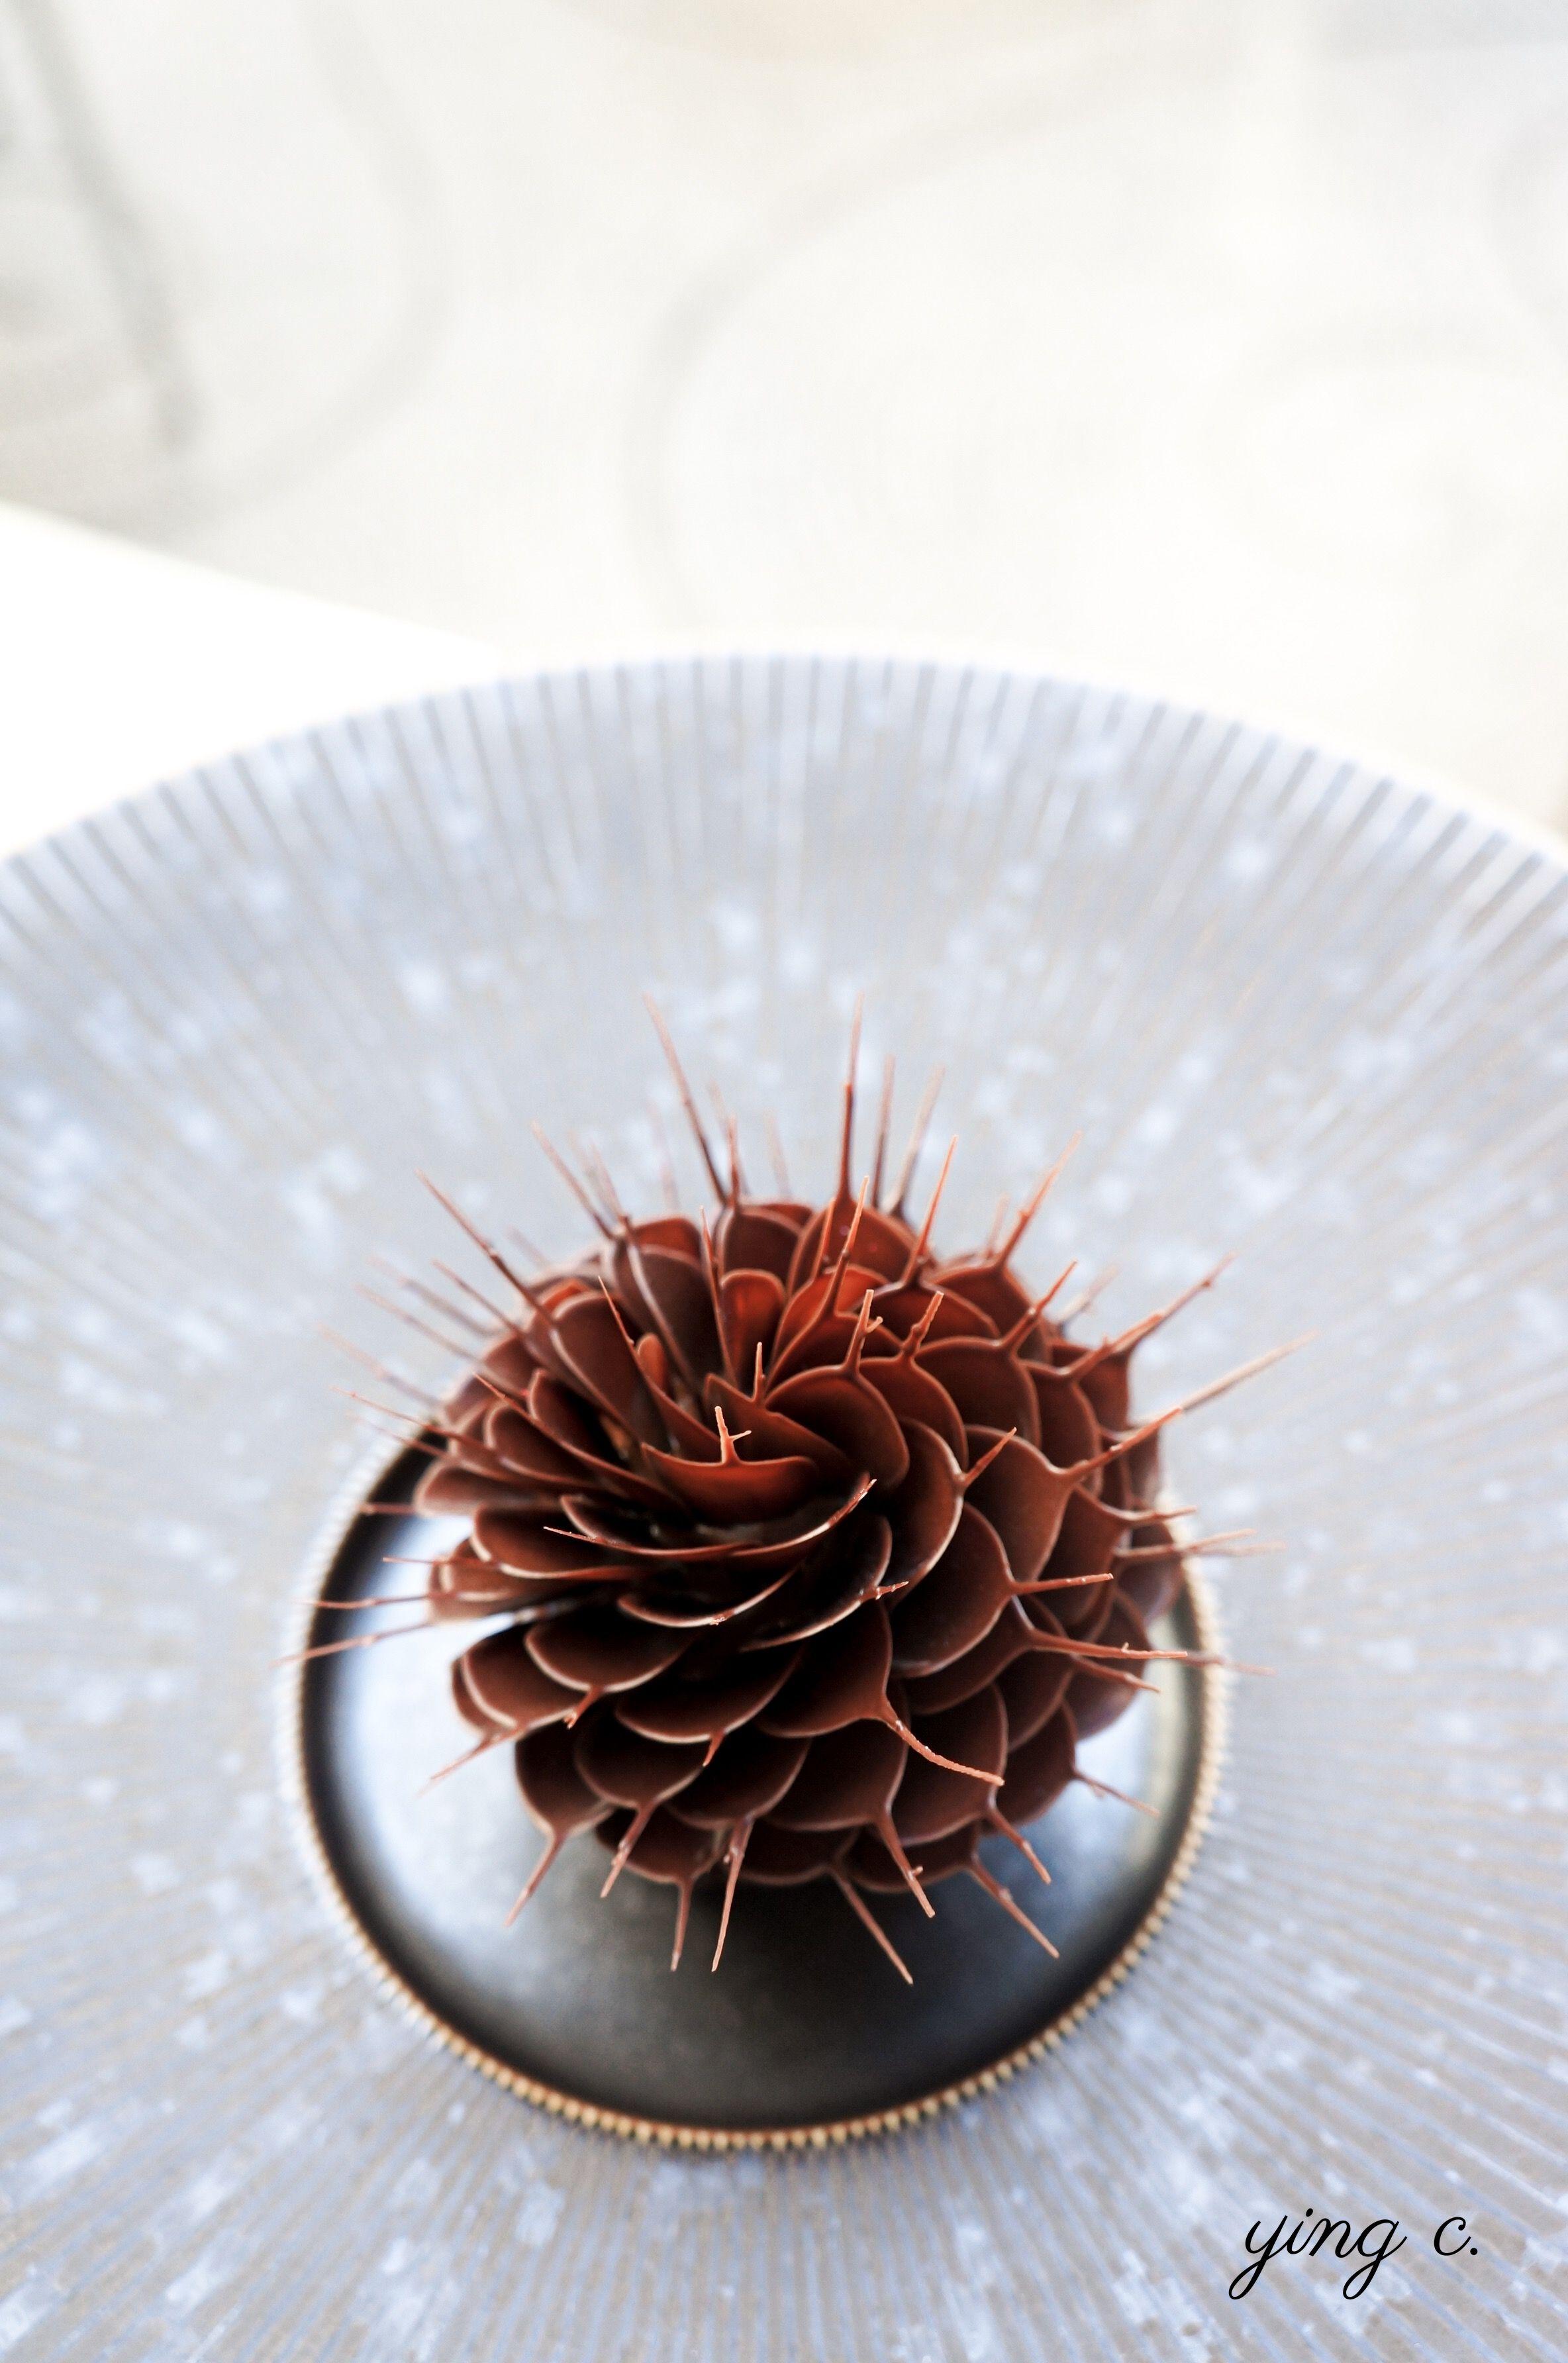 Maxime 為 2019 年 Taste of Paris 巴黎美食展設計的「 Fleur de Cacao 」(可可之花)。